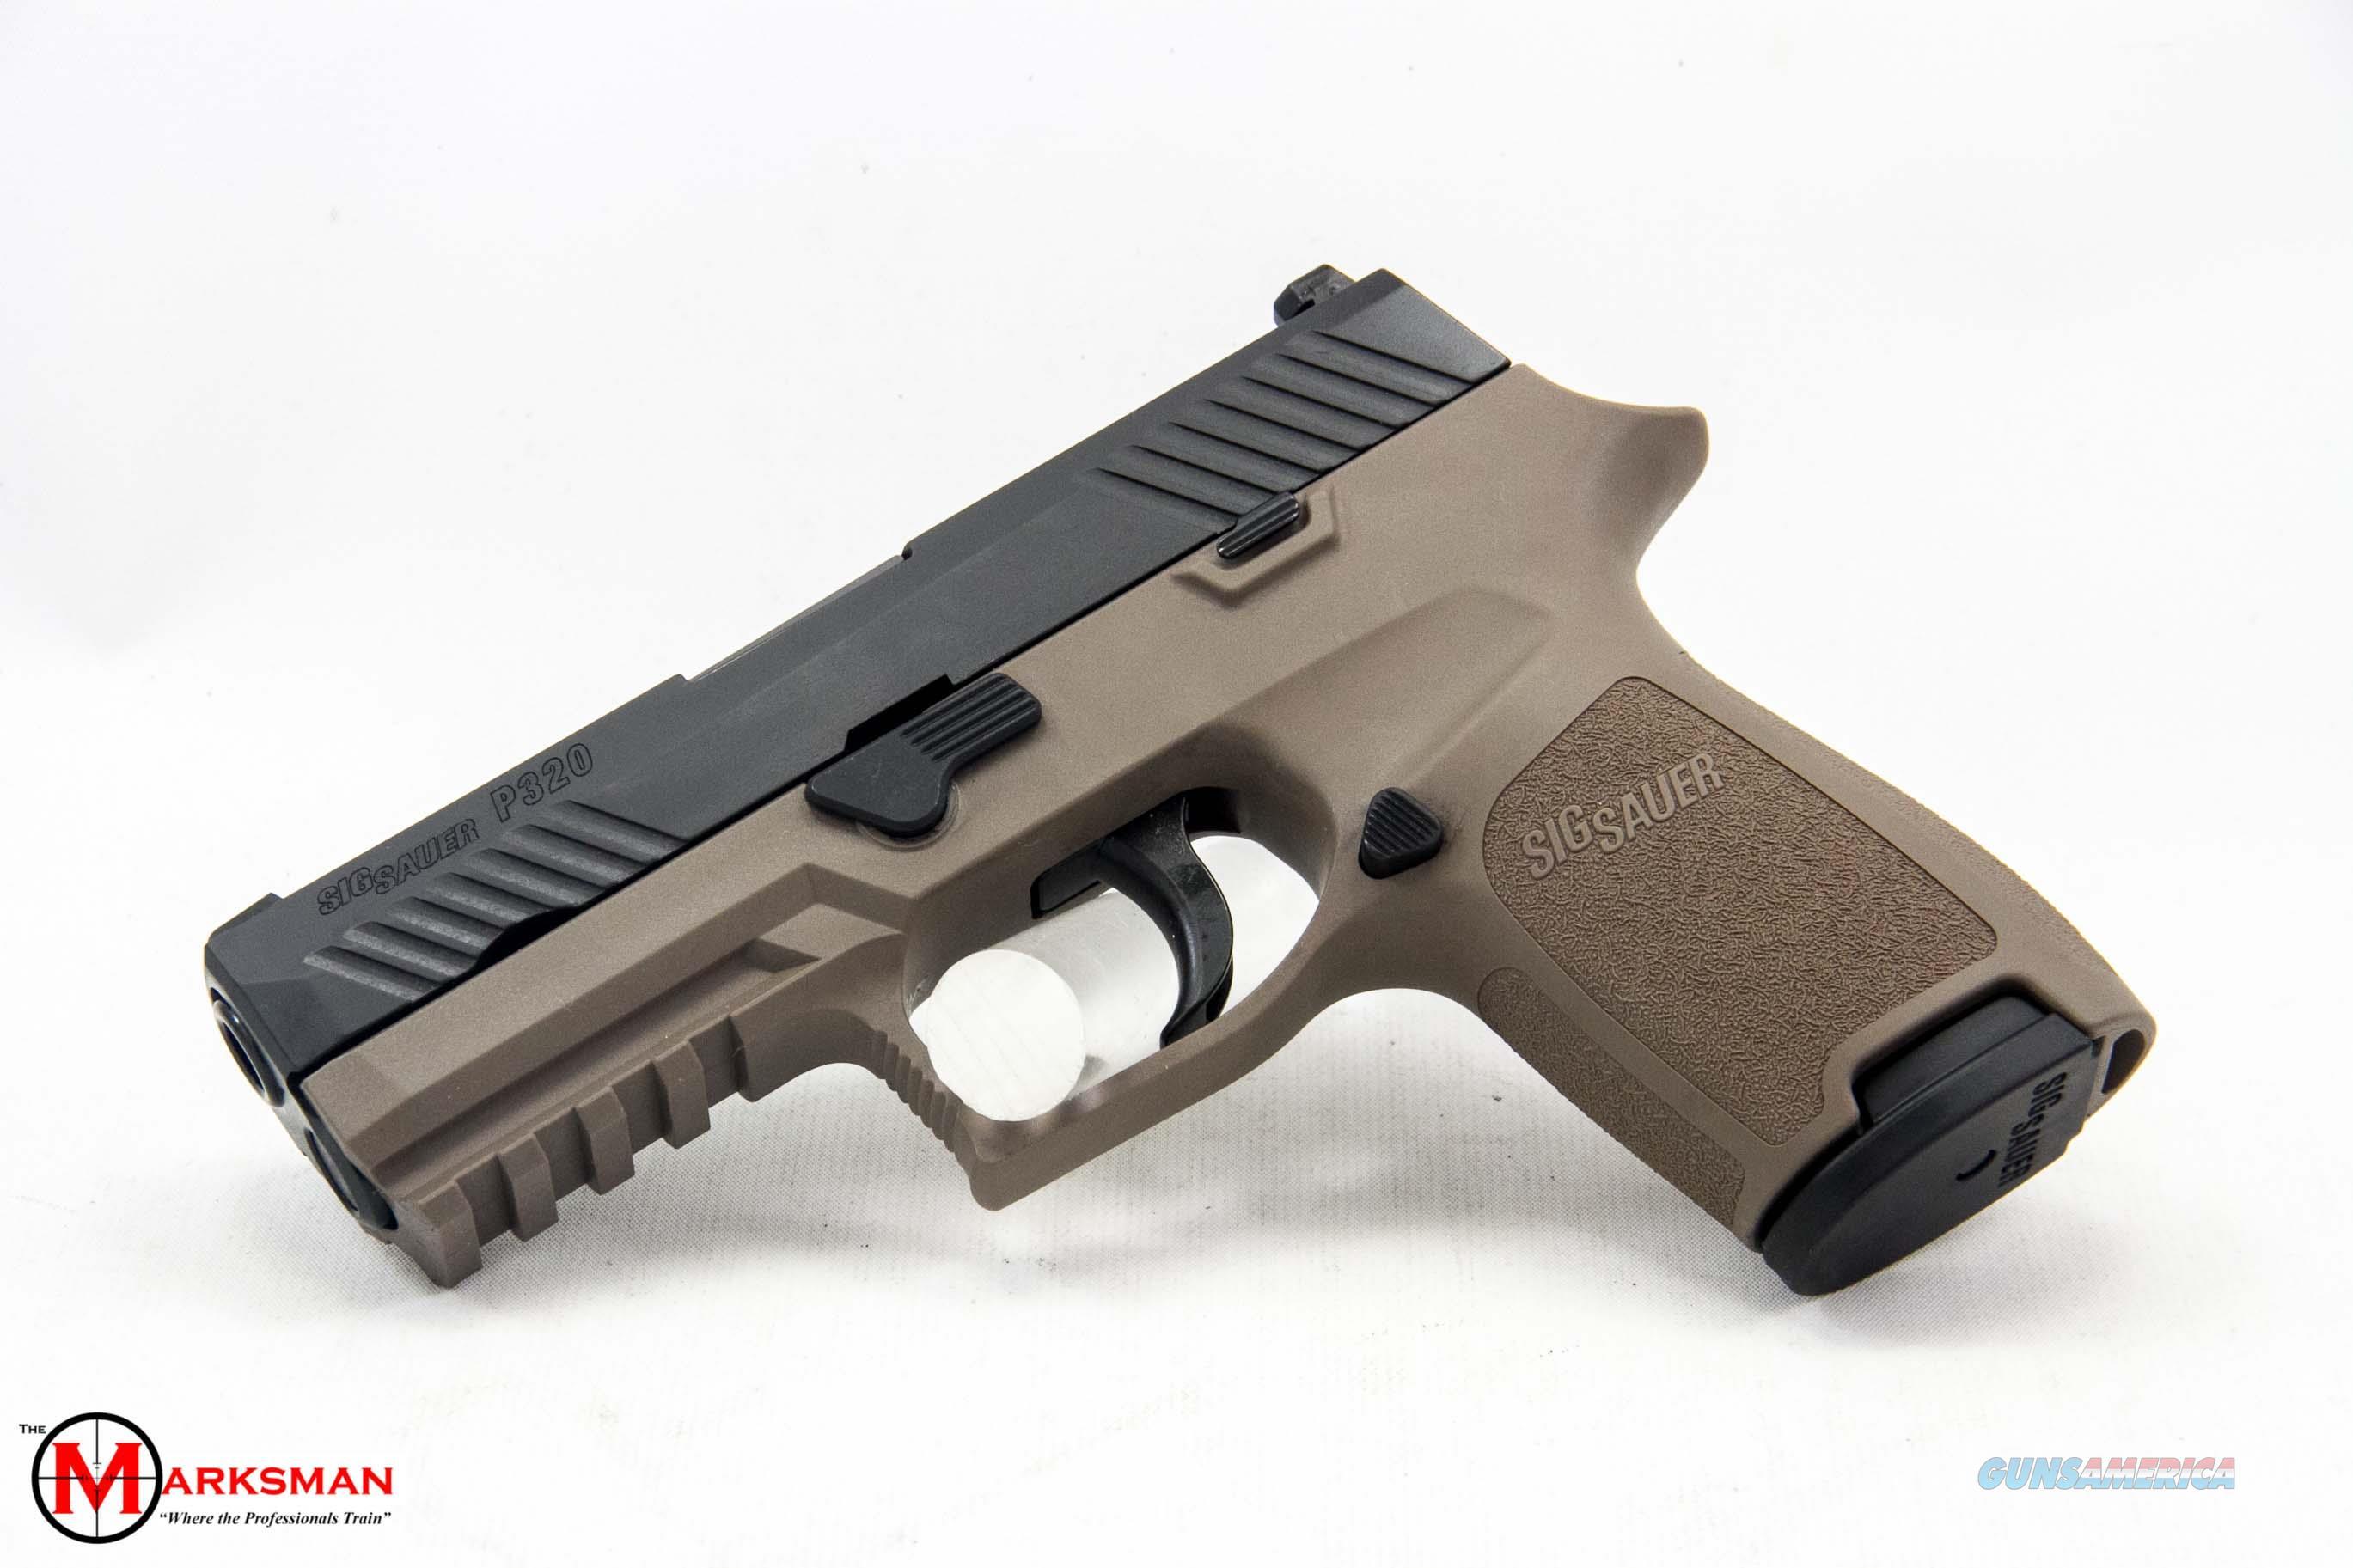 Sig Sauer P320 Compact, 9mm, Flat Dark Earth NEW  Guns > Pistols > Sig - Sauer/Sigarms Pistols > P320